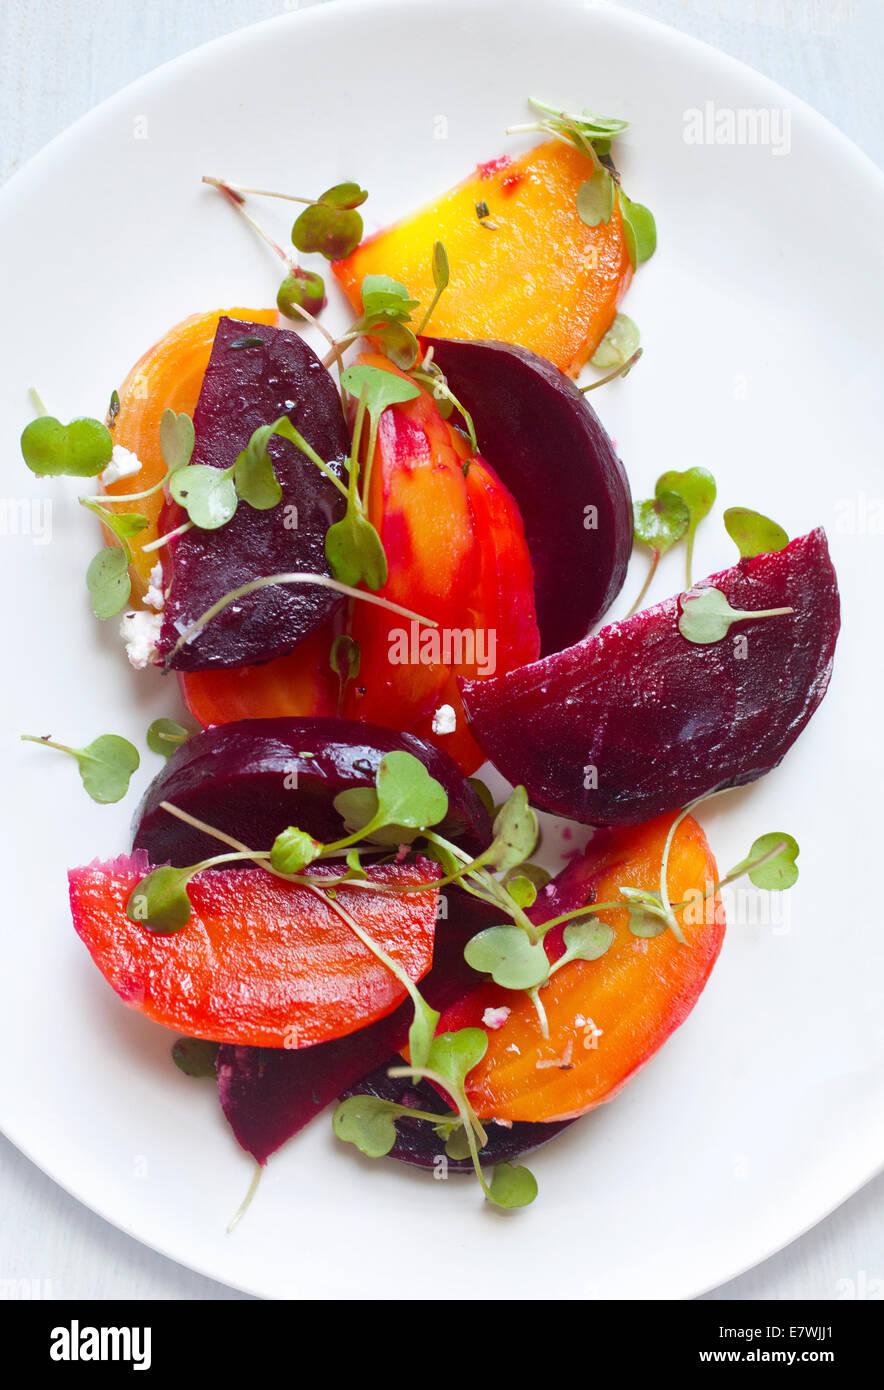 Yellow, Orange, And Red Beet Salad Stock Photo, Royalty Free Image ...